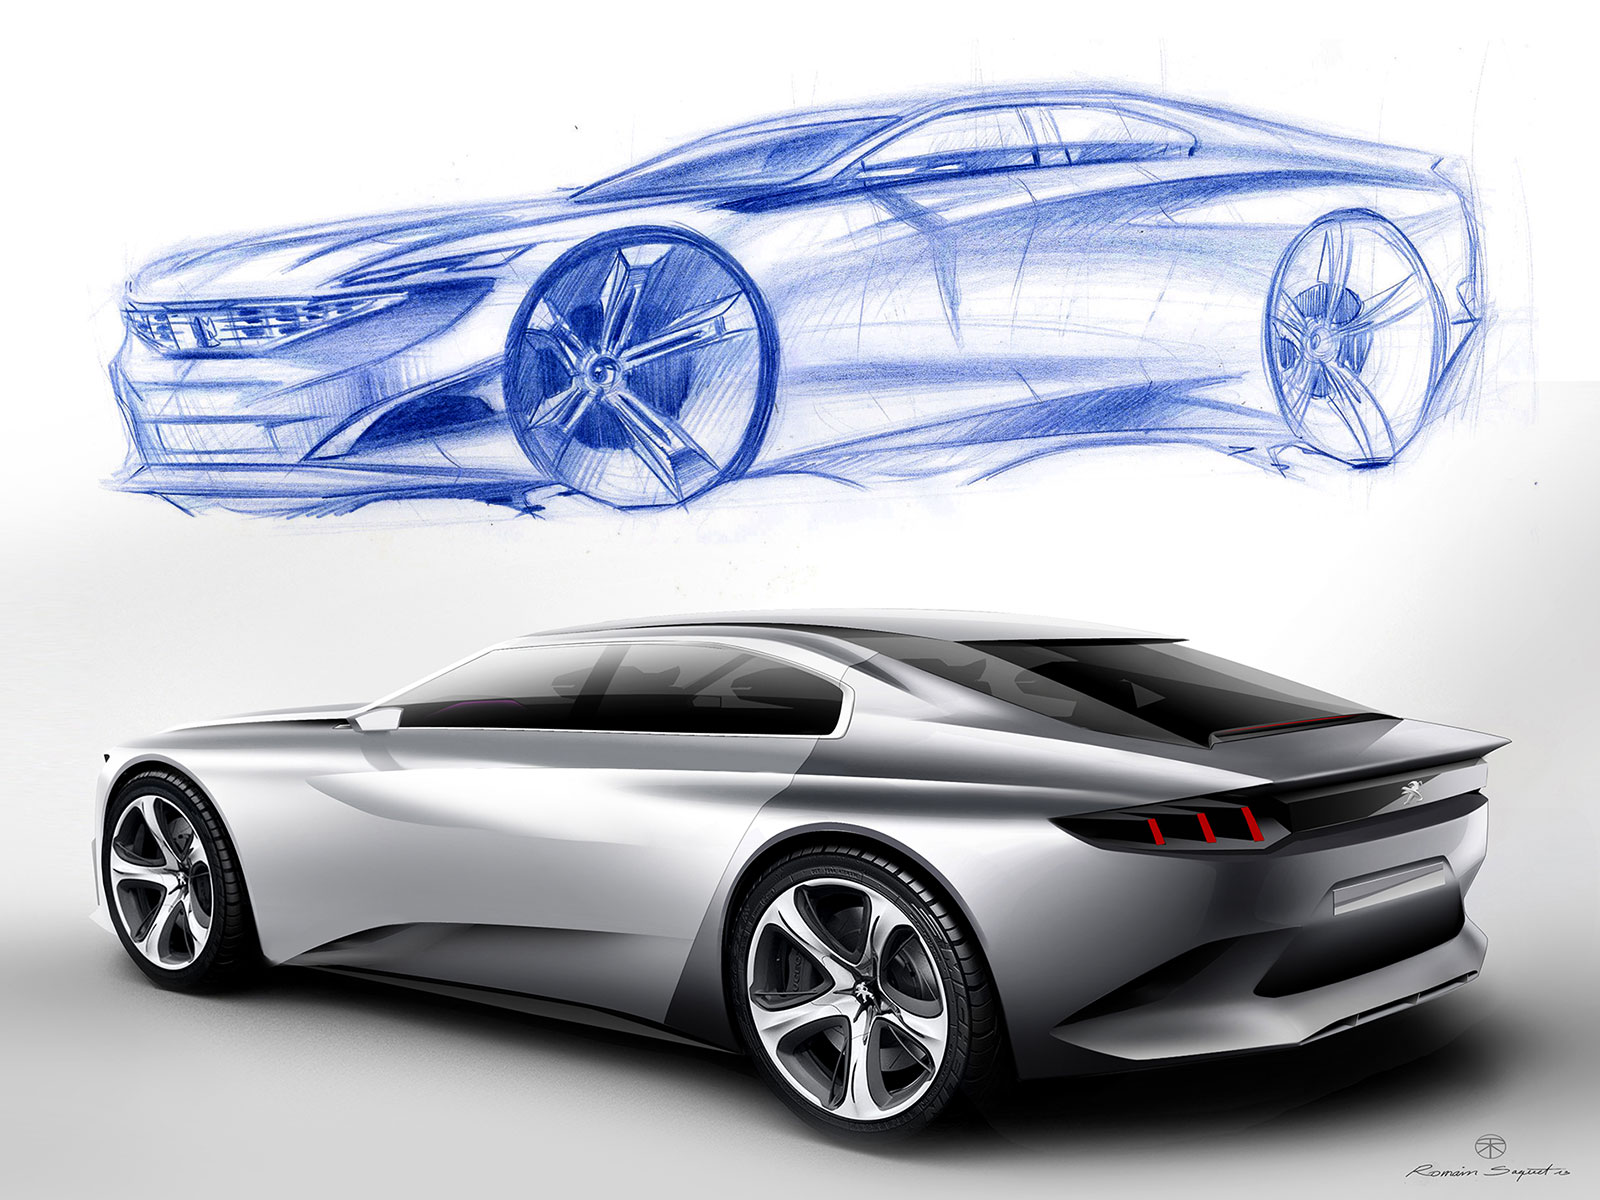 Peugeot Exalt Concept Design Sketch Rendering Car Body